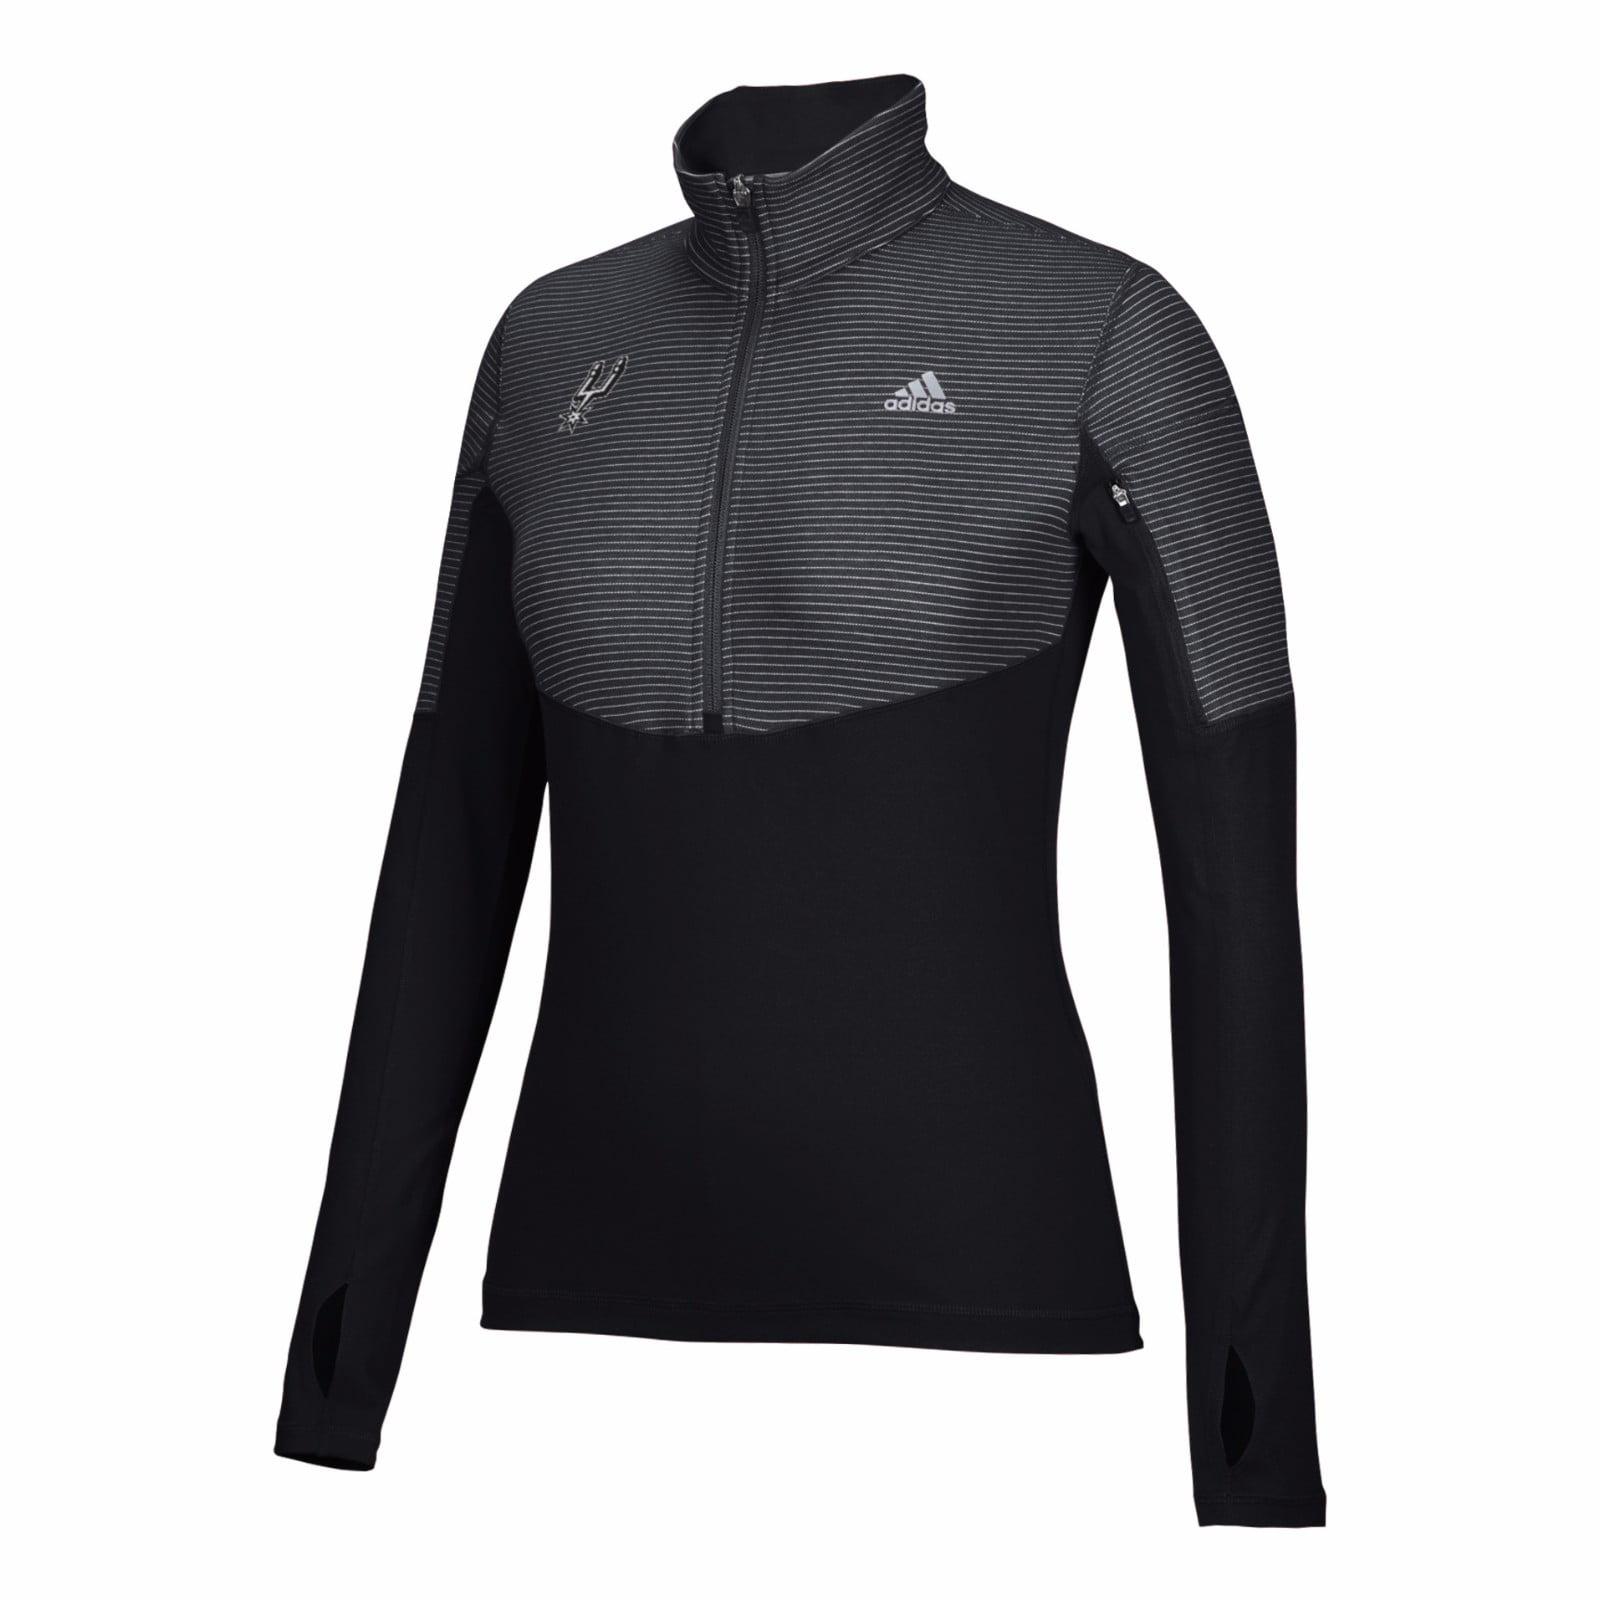 San Antonio Spurs NBA Adidas Black Lightweight Climalite Performance Half Zip Team Logo Pullover Jacket For Women by Adidas